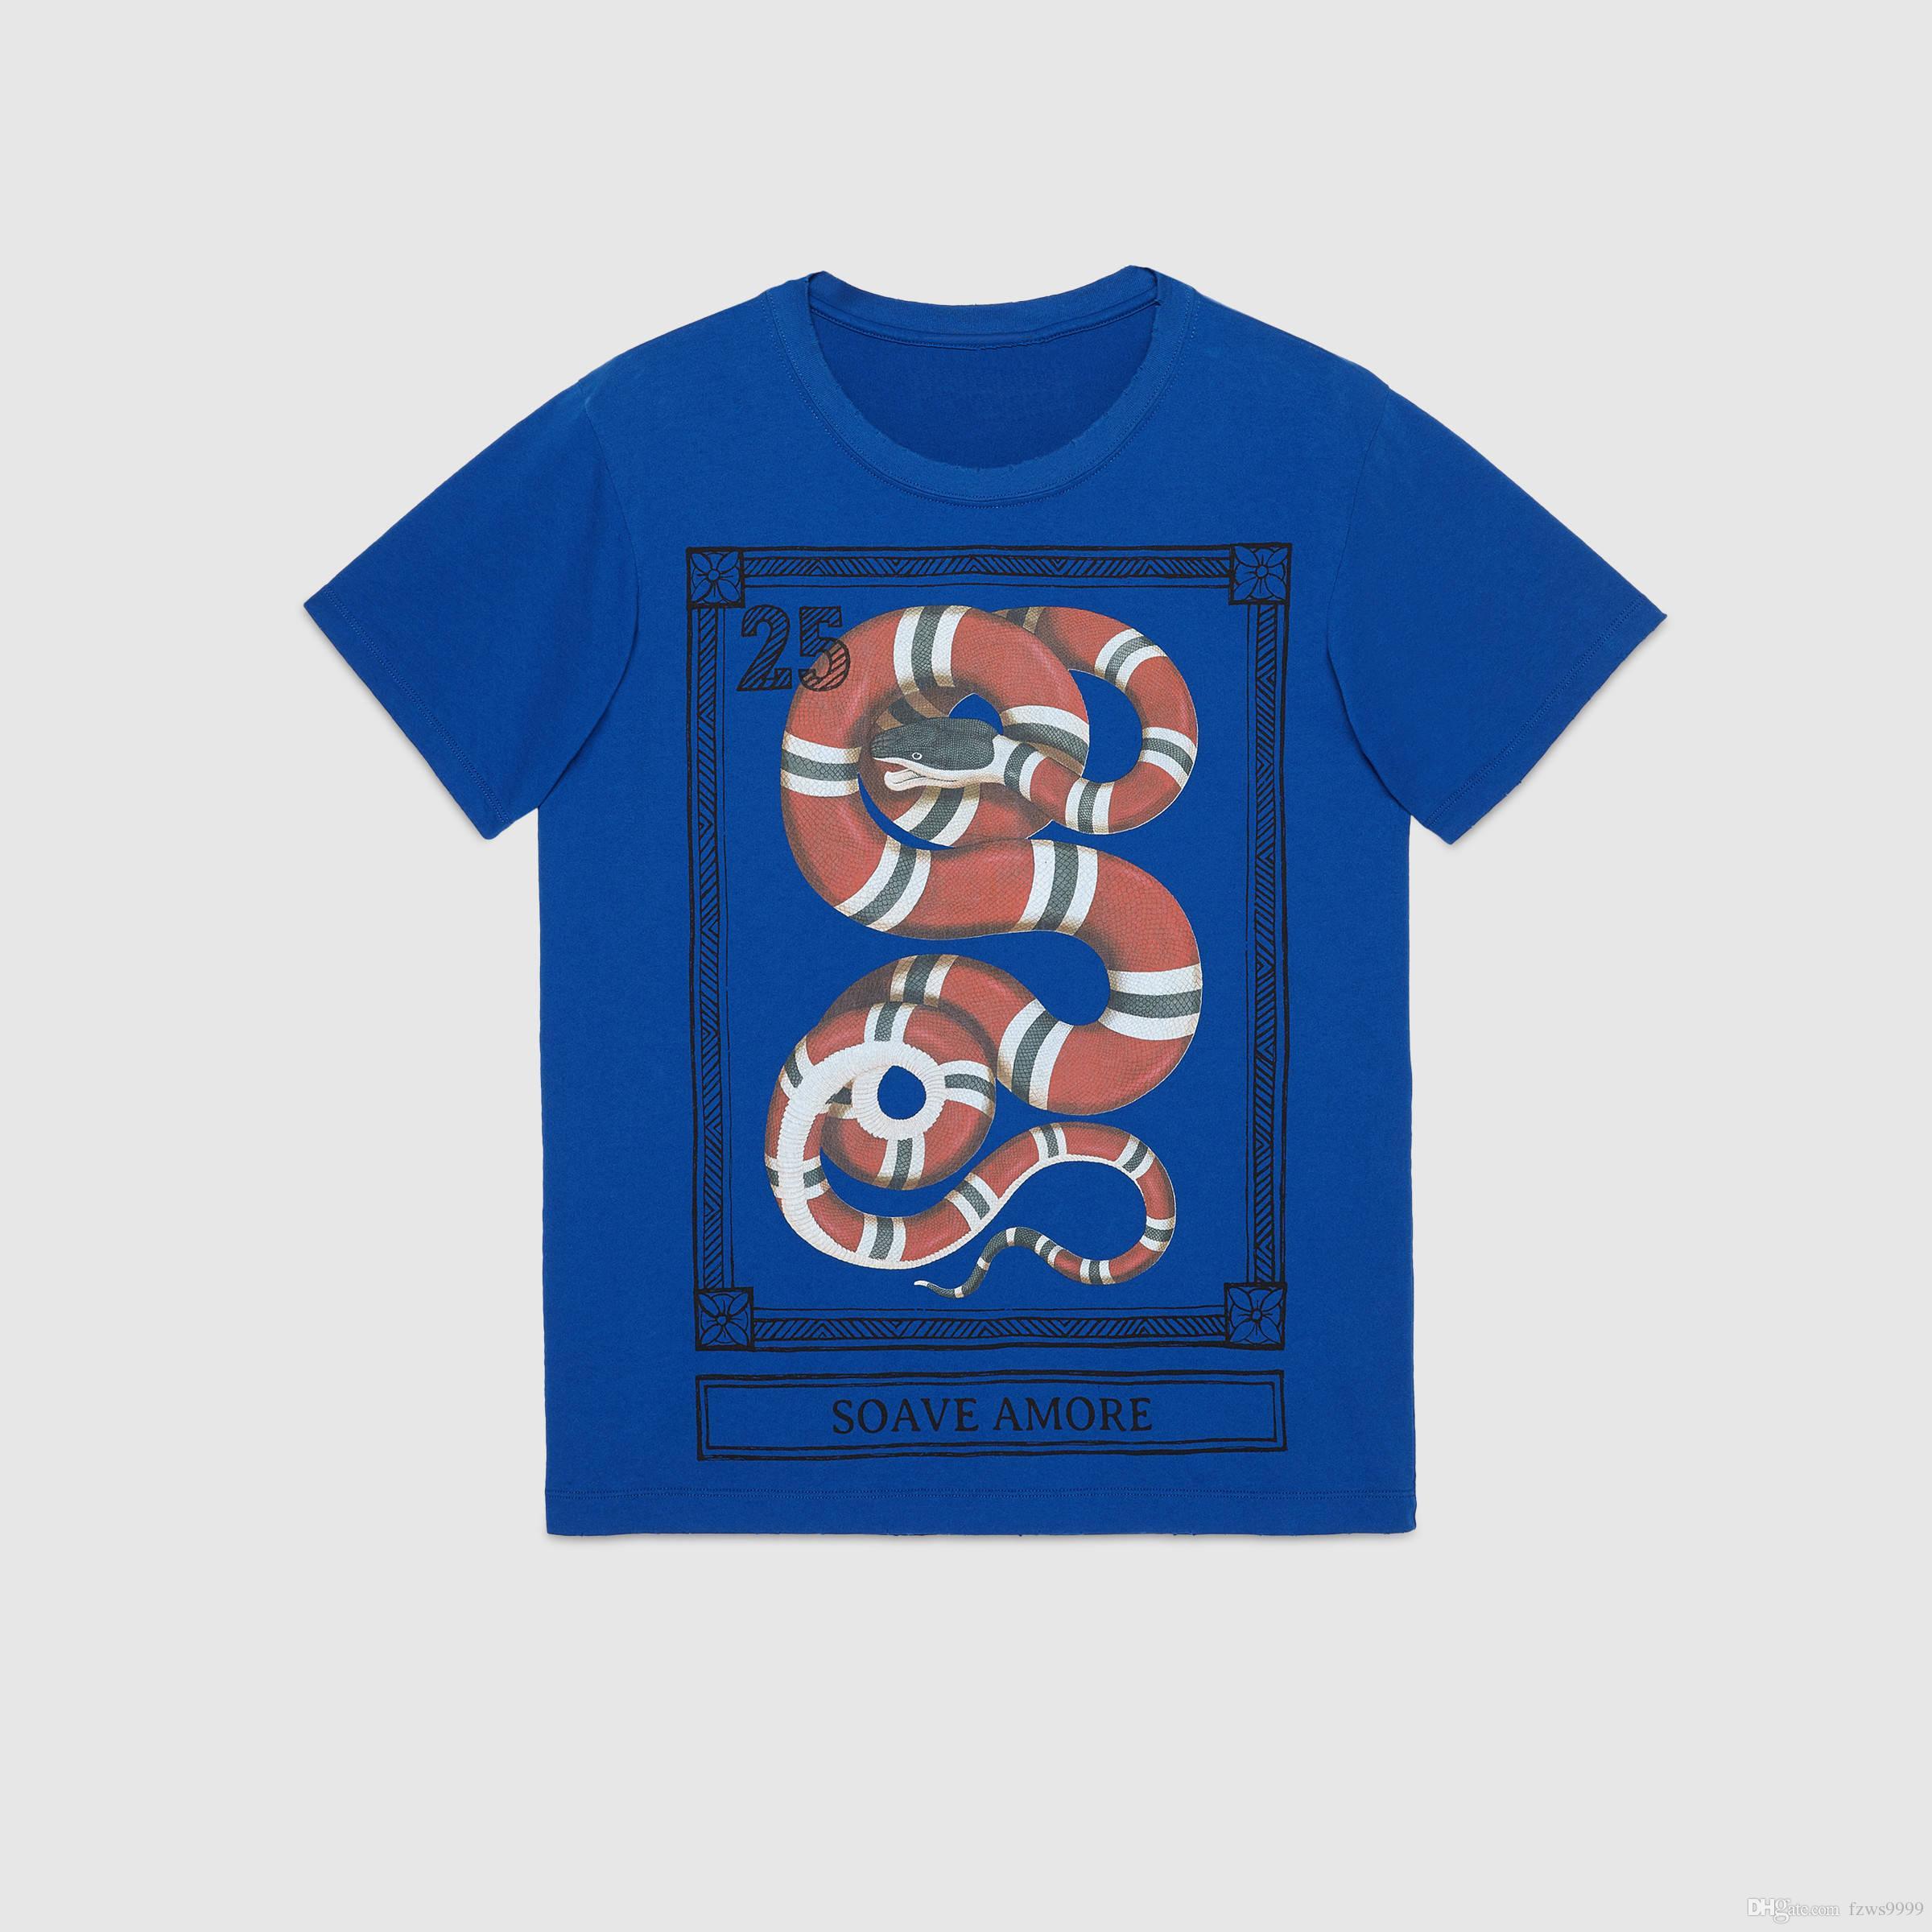 34a3dc52951c 2018 New Arrival Mens T Shirt 3d Print Summer O-neck Casual Cotton ...